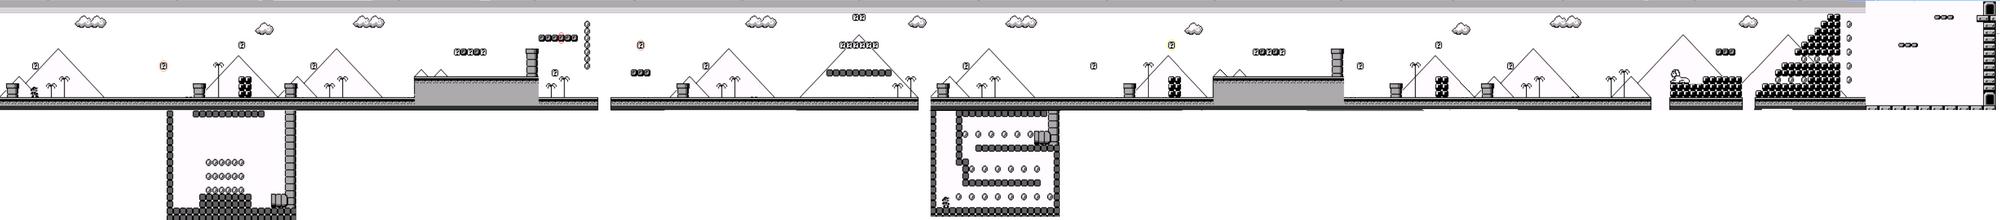 SML Screenshot Level 1-1